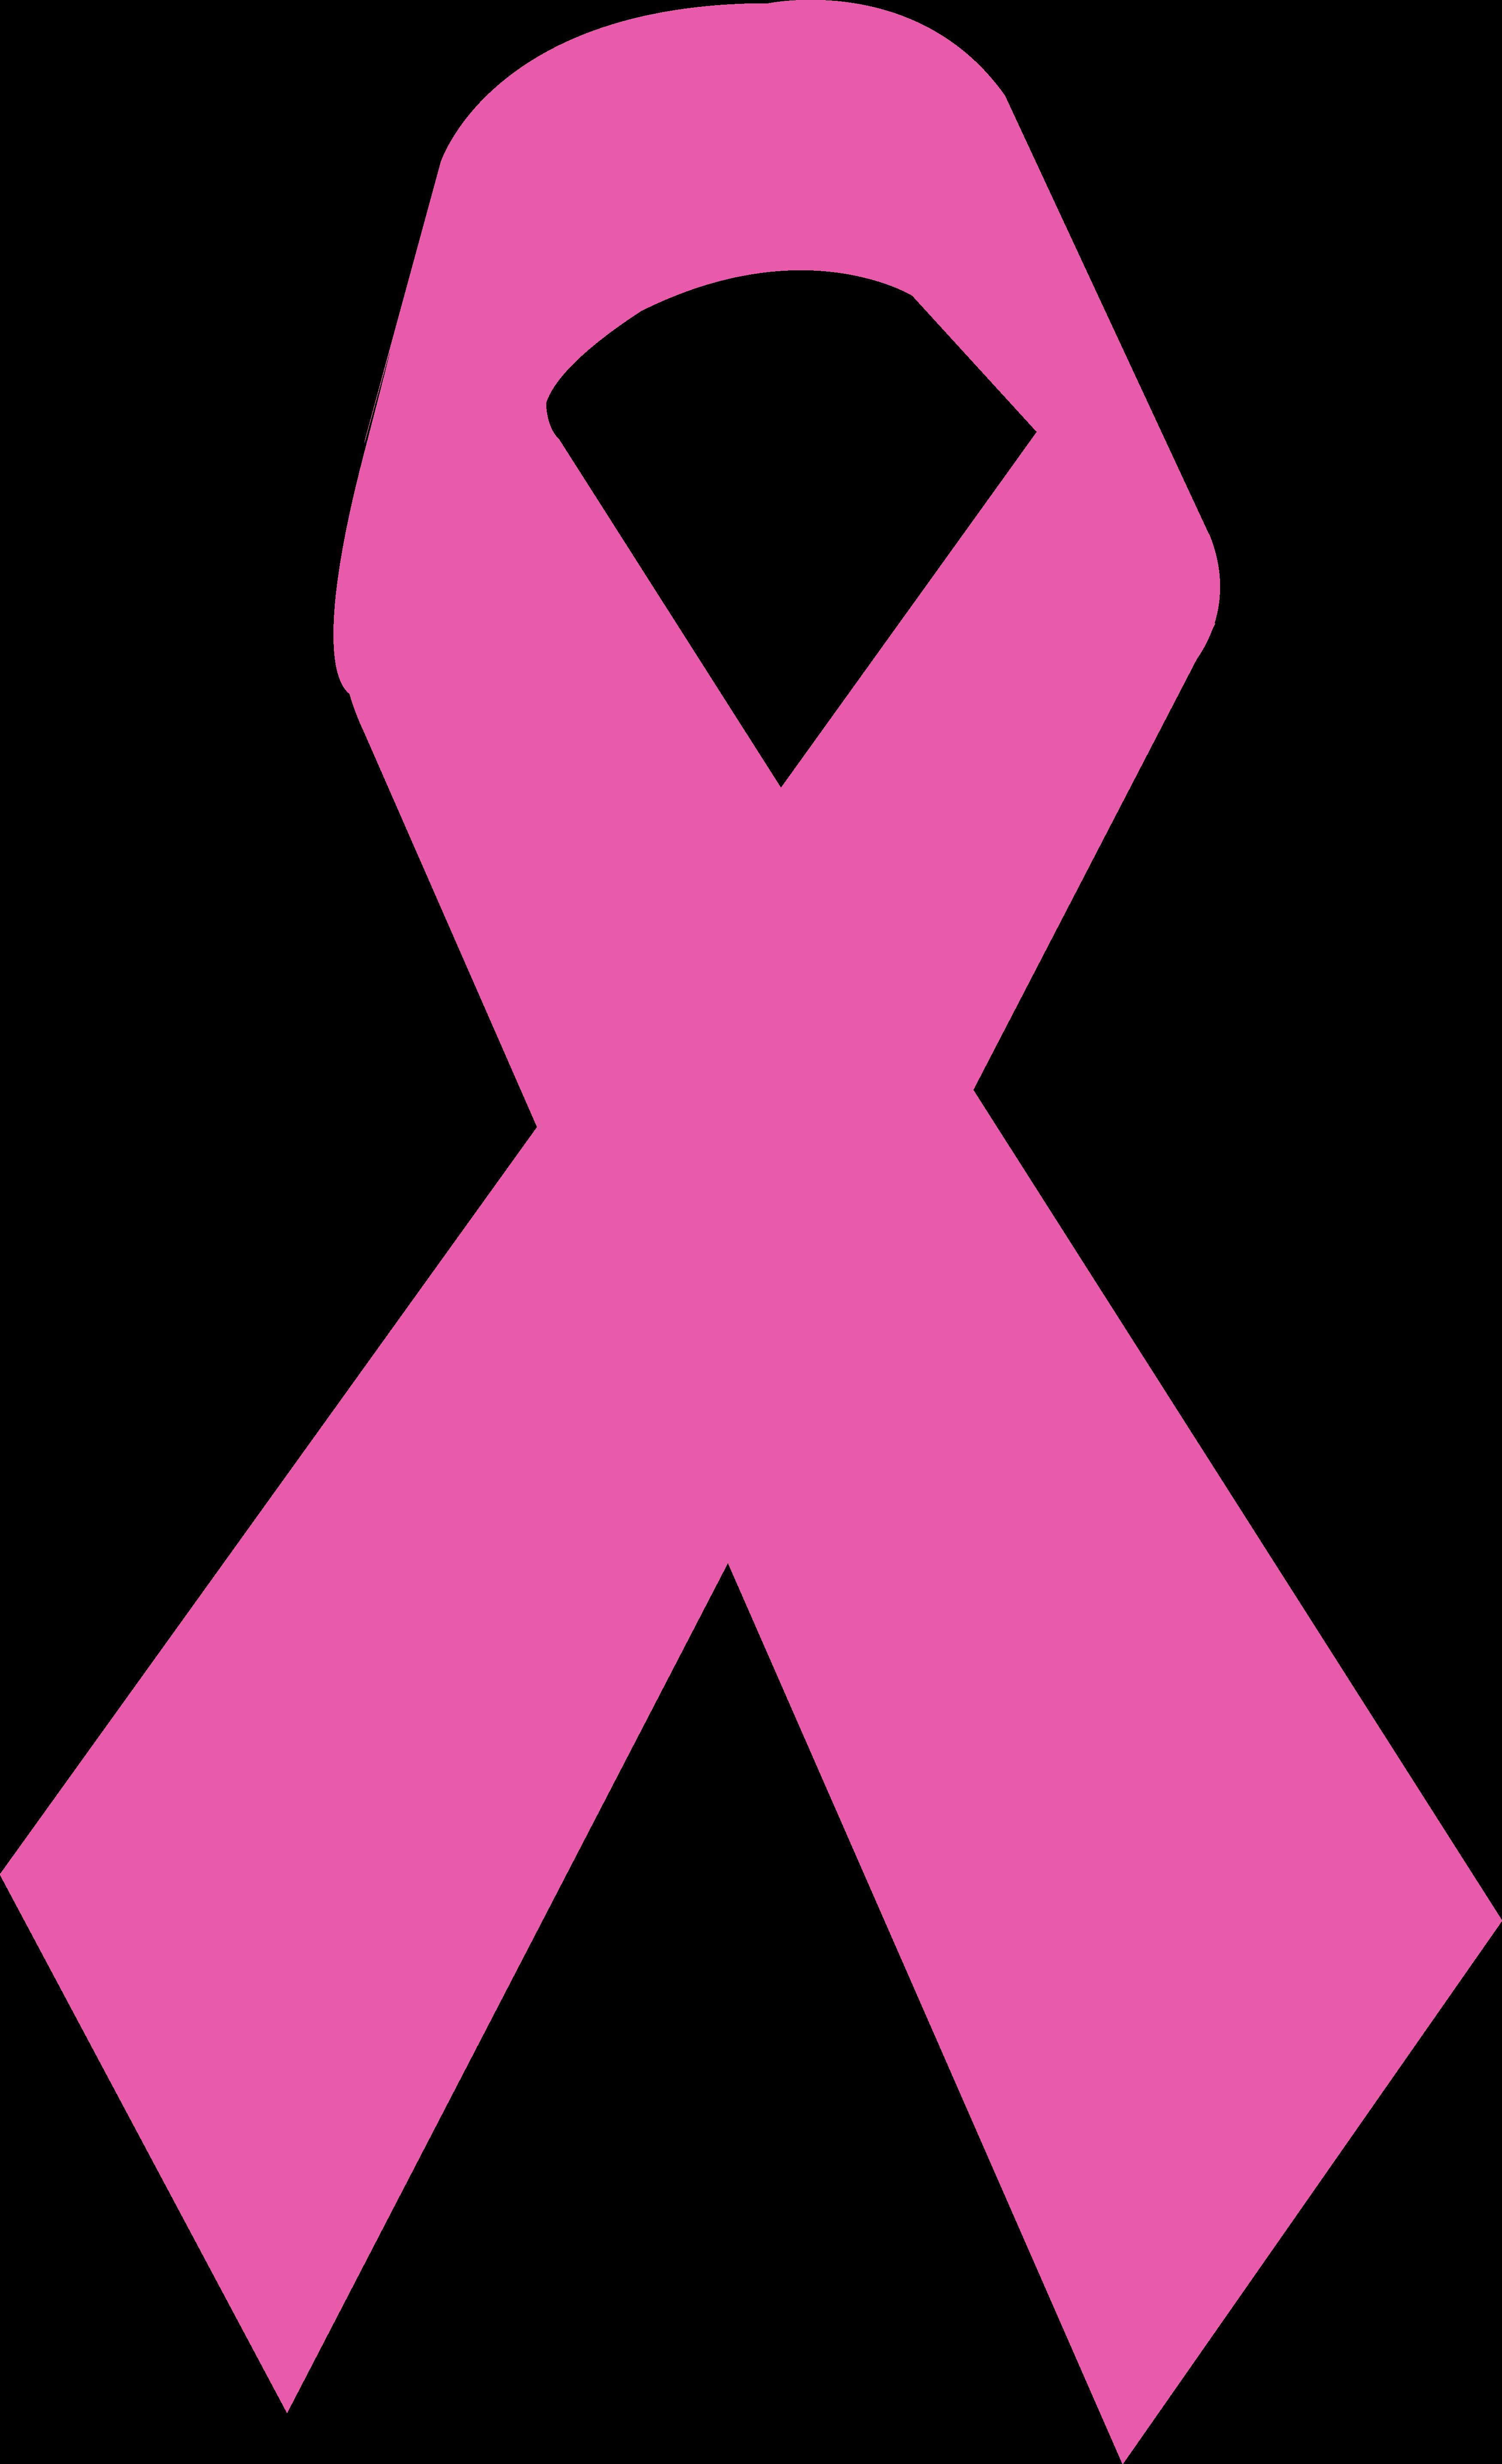 Cancer de mama clipart clip art free download Cancer de mama simbolo clipart images gallery for free download ... clip art free download